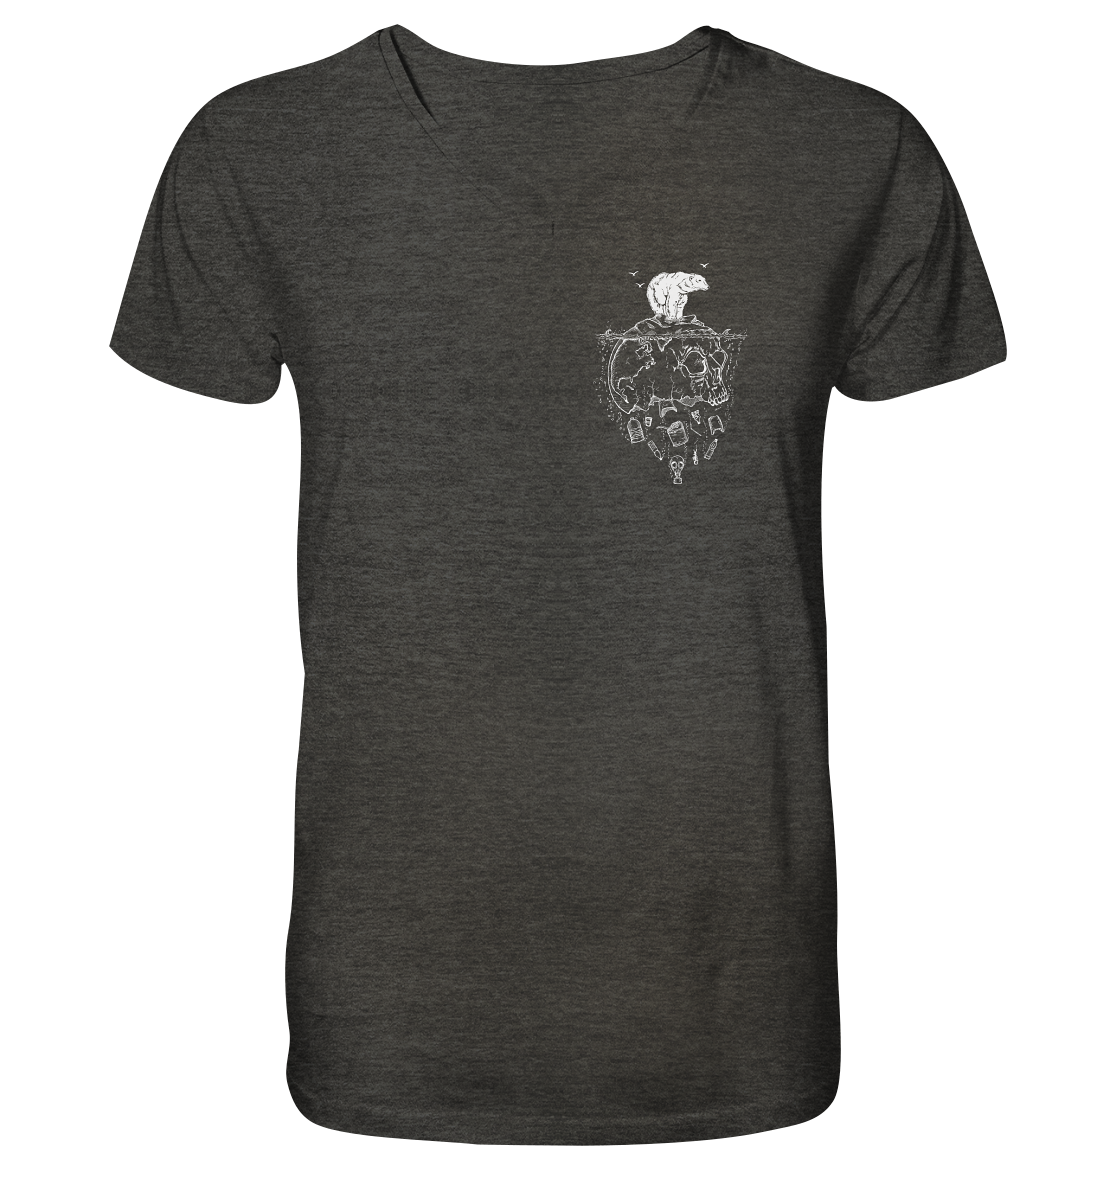 front-mens-organic-v-neck-shirt-252625-1116x-19.png